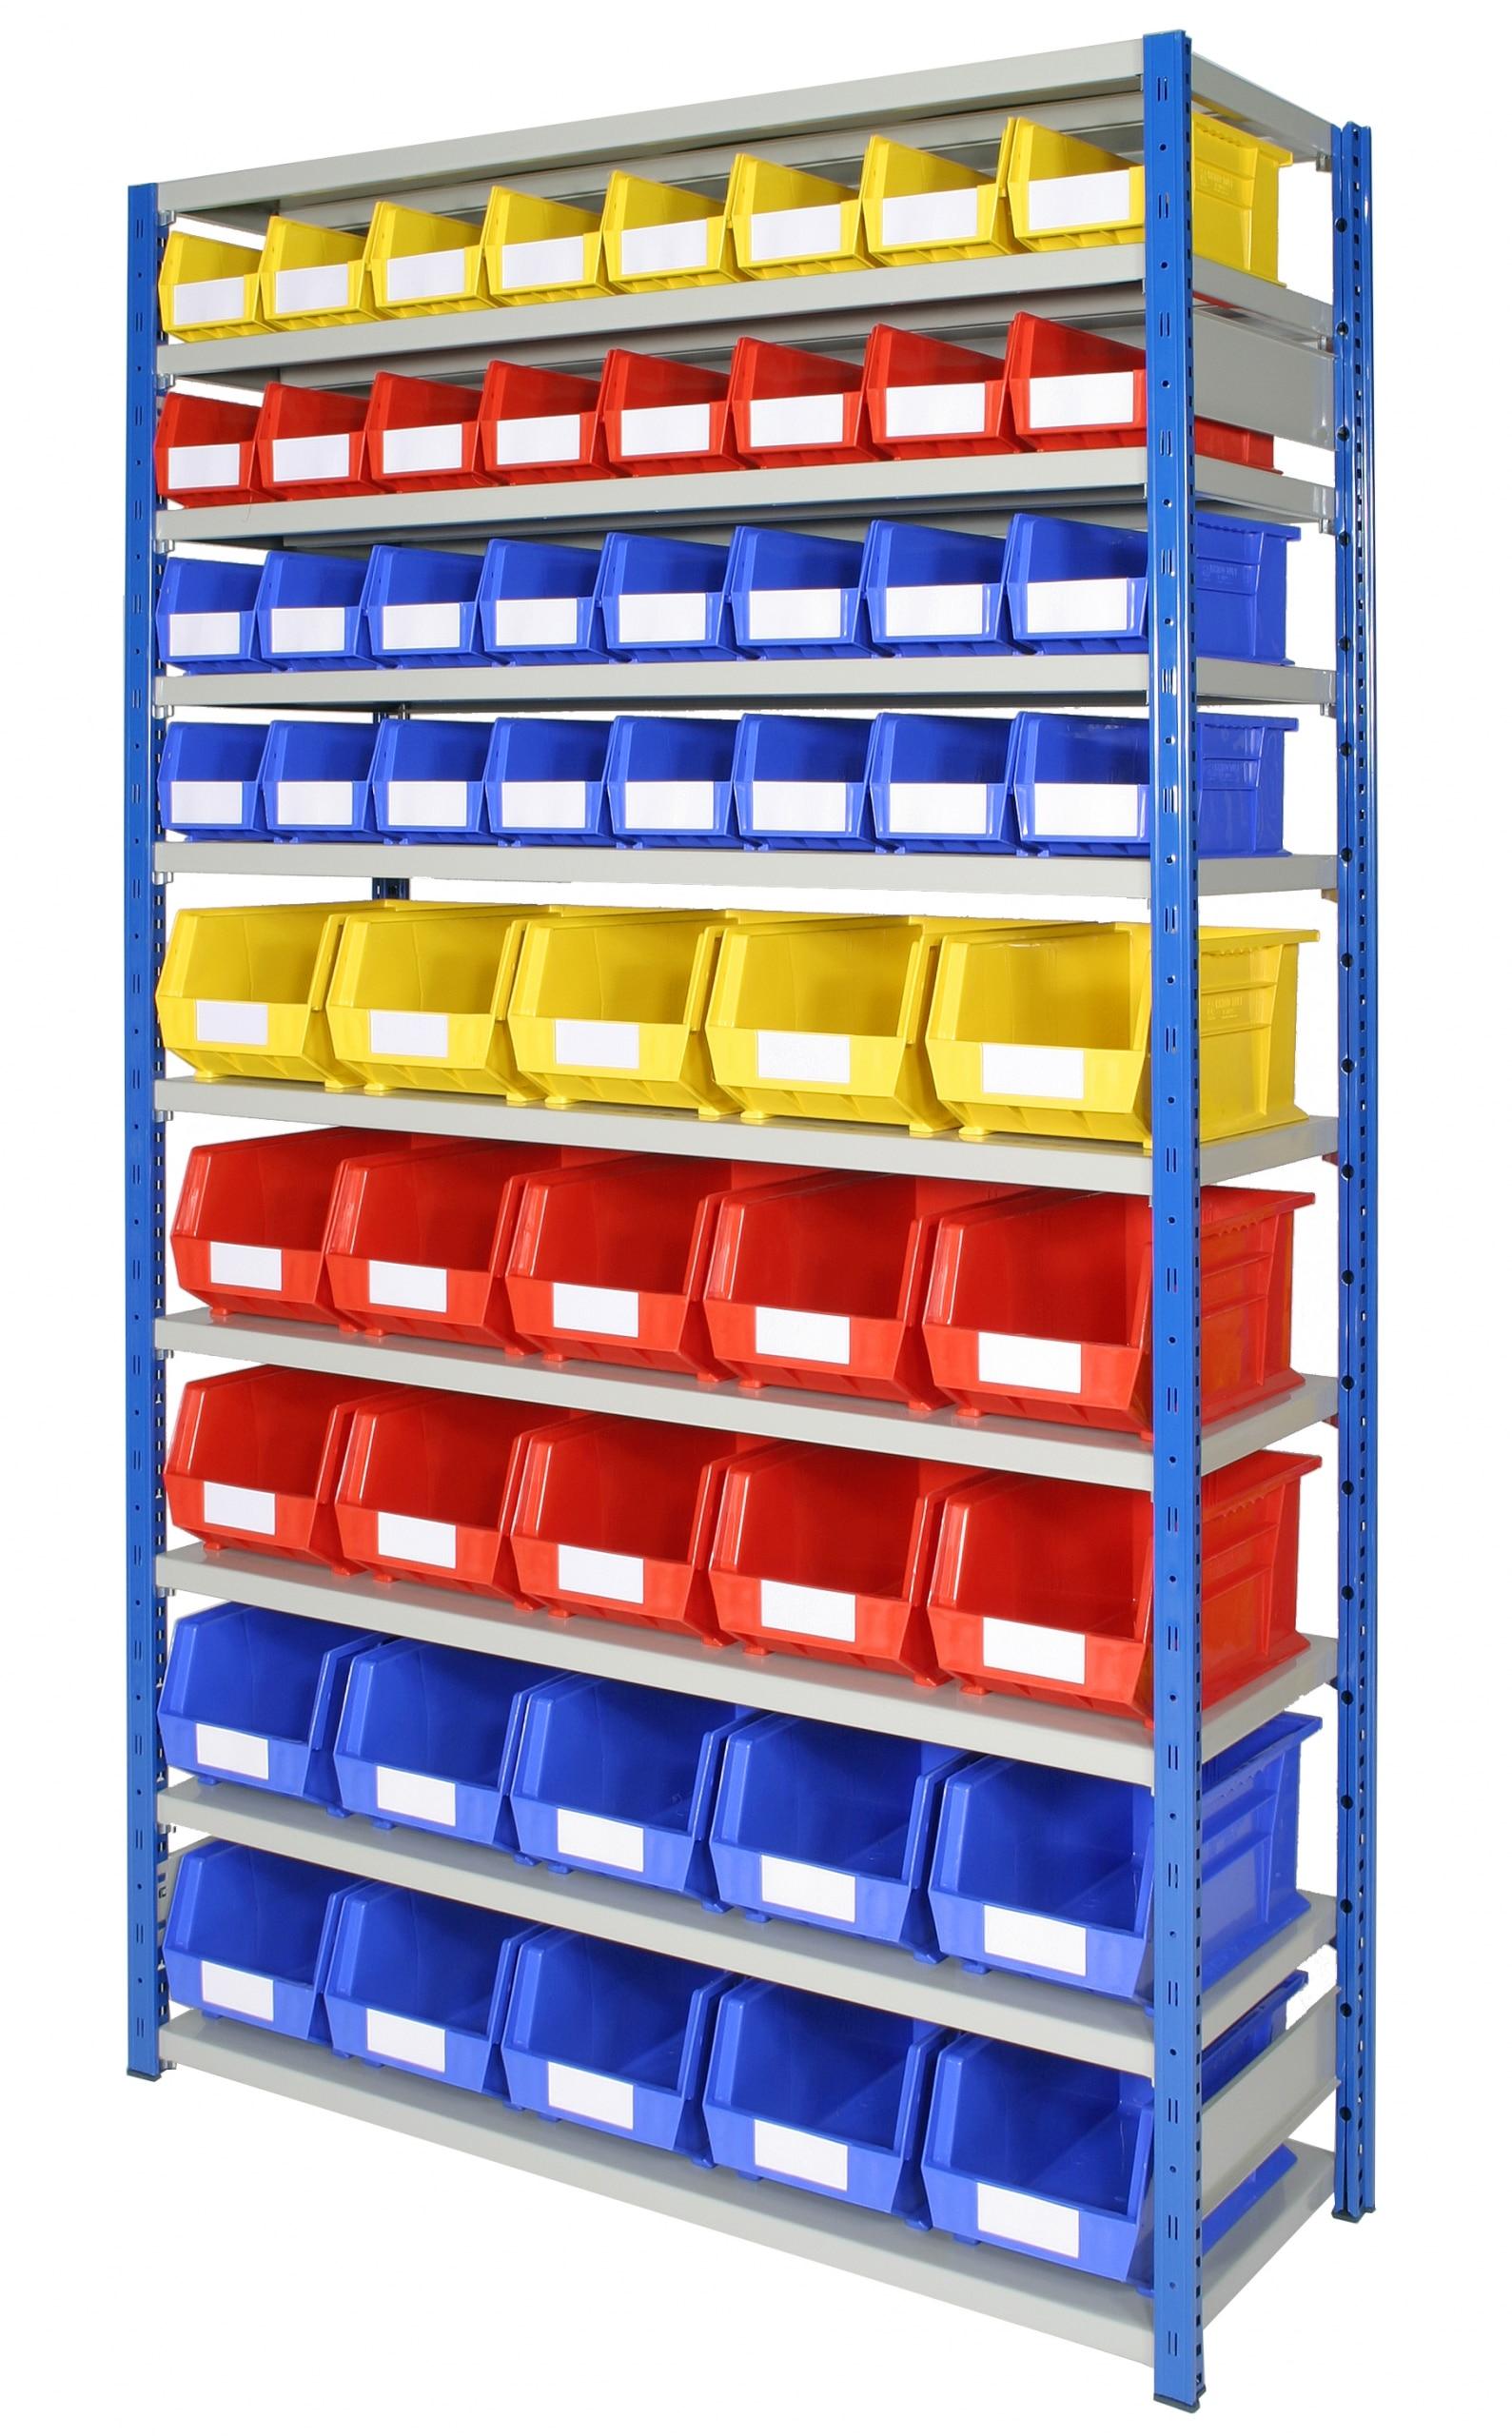 Anco Plastic Storage Bin shelving